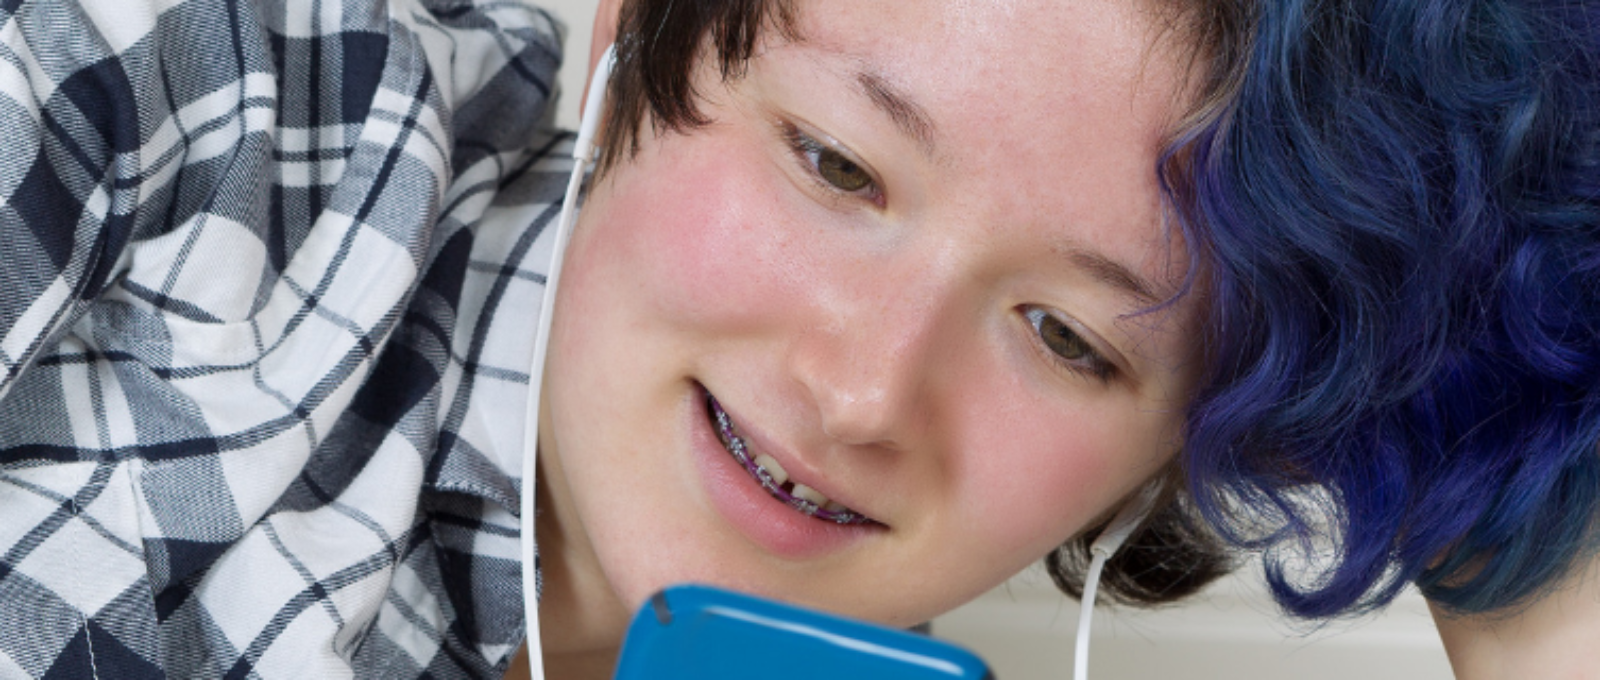 Teenager looking at phone